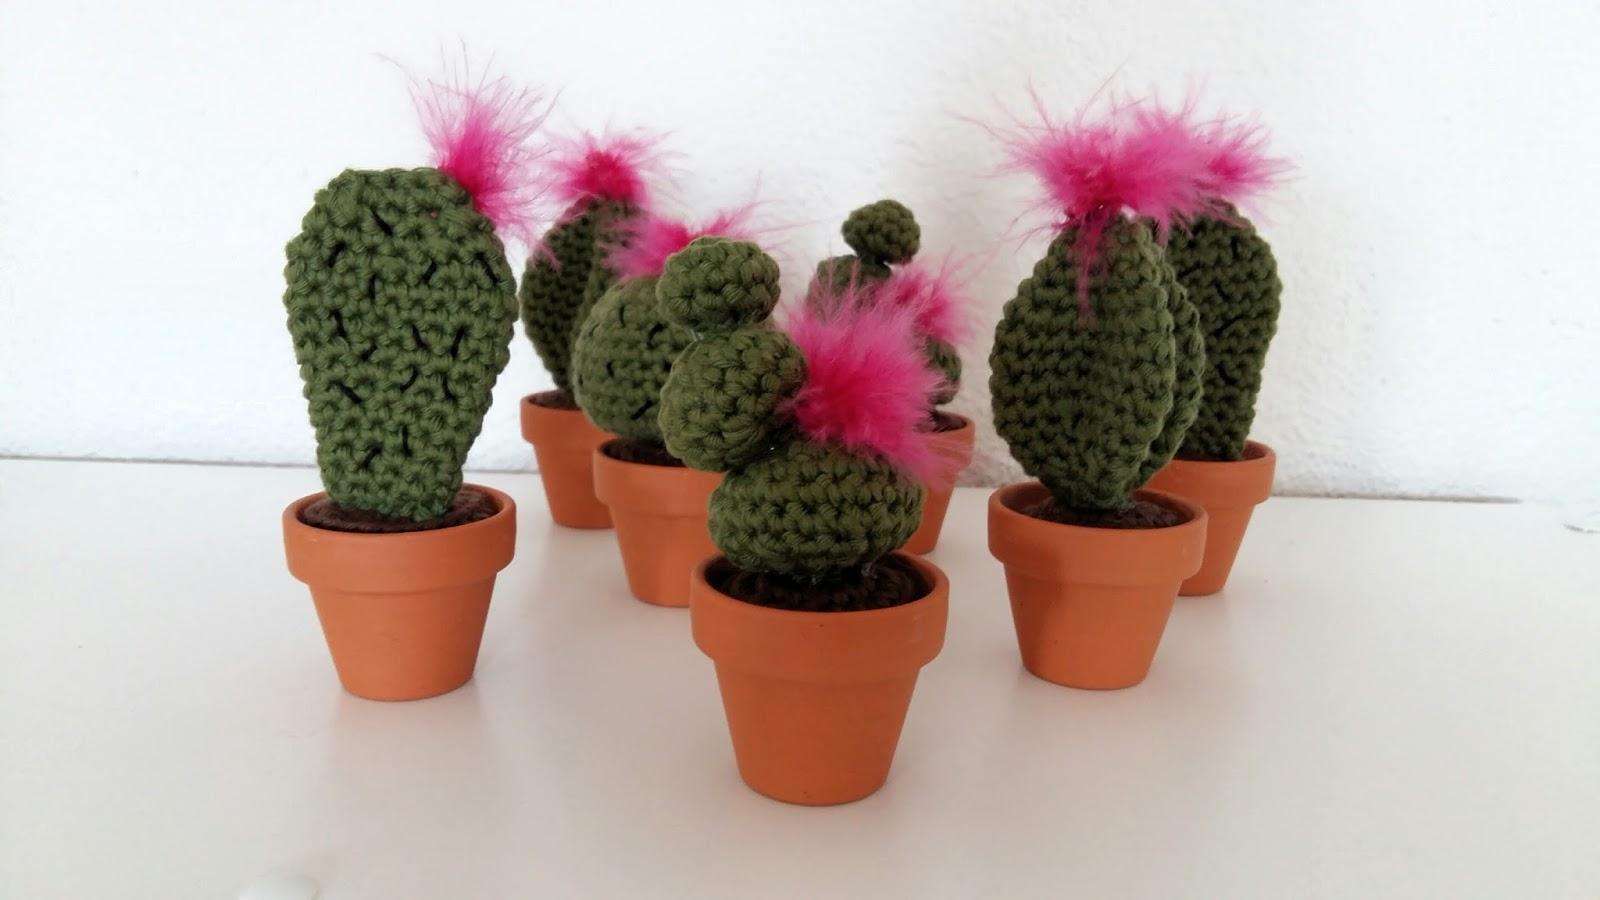 f e du tricot mini cactus au crochet tuto inside. Black Bedroom Furniture Sets. Home Design Ideas